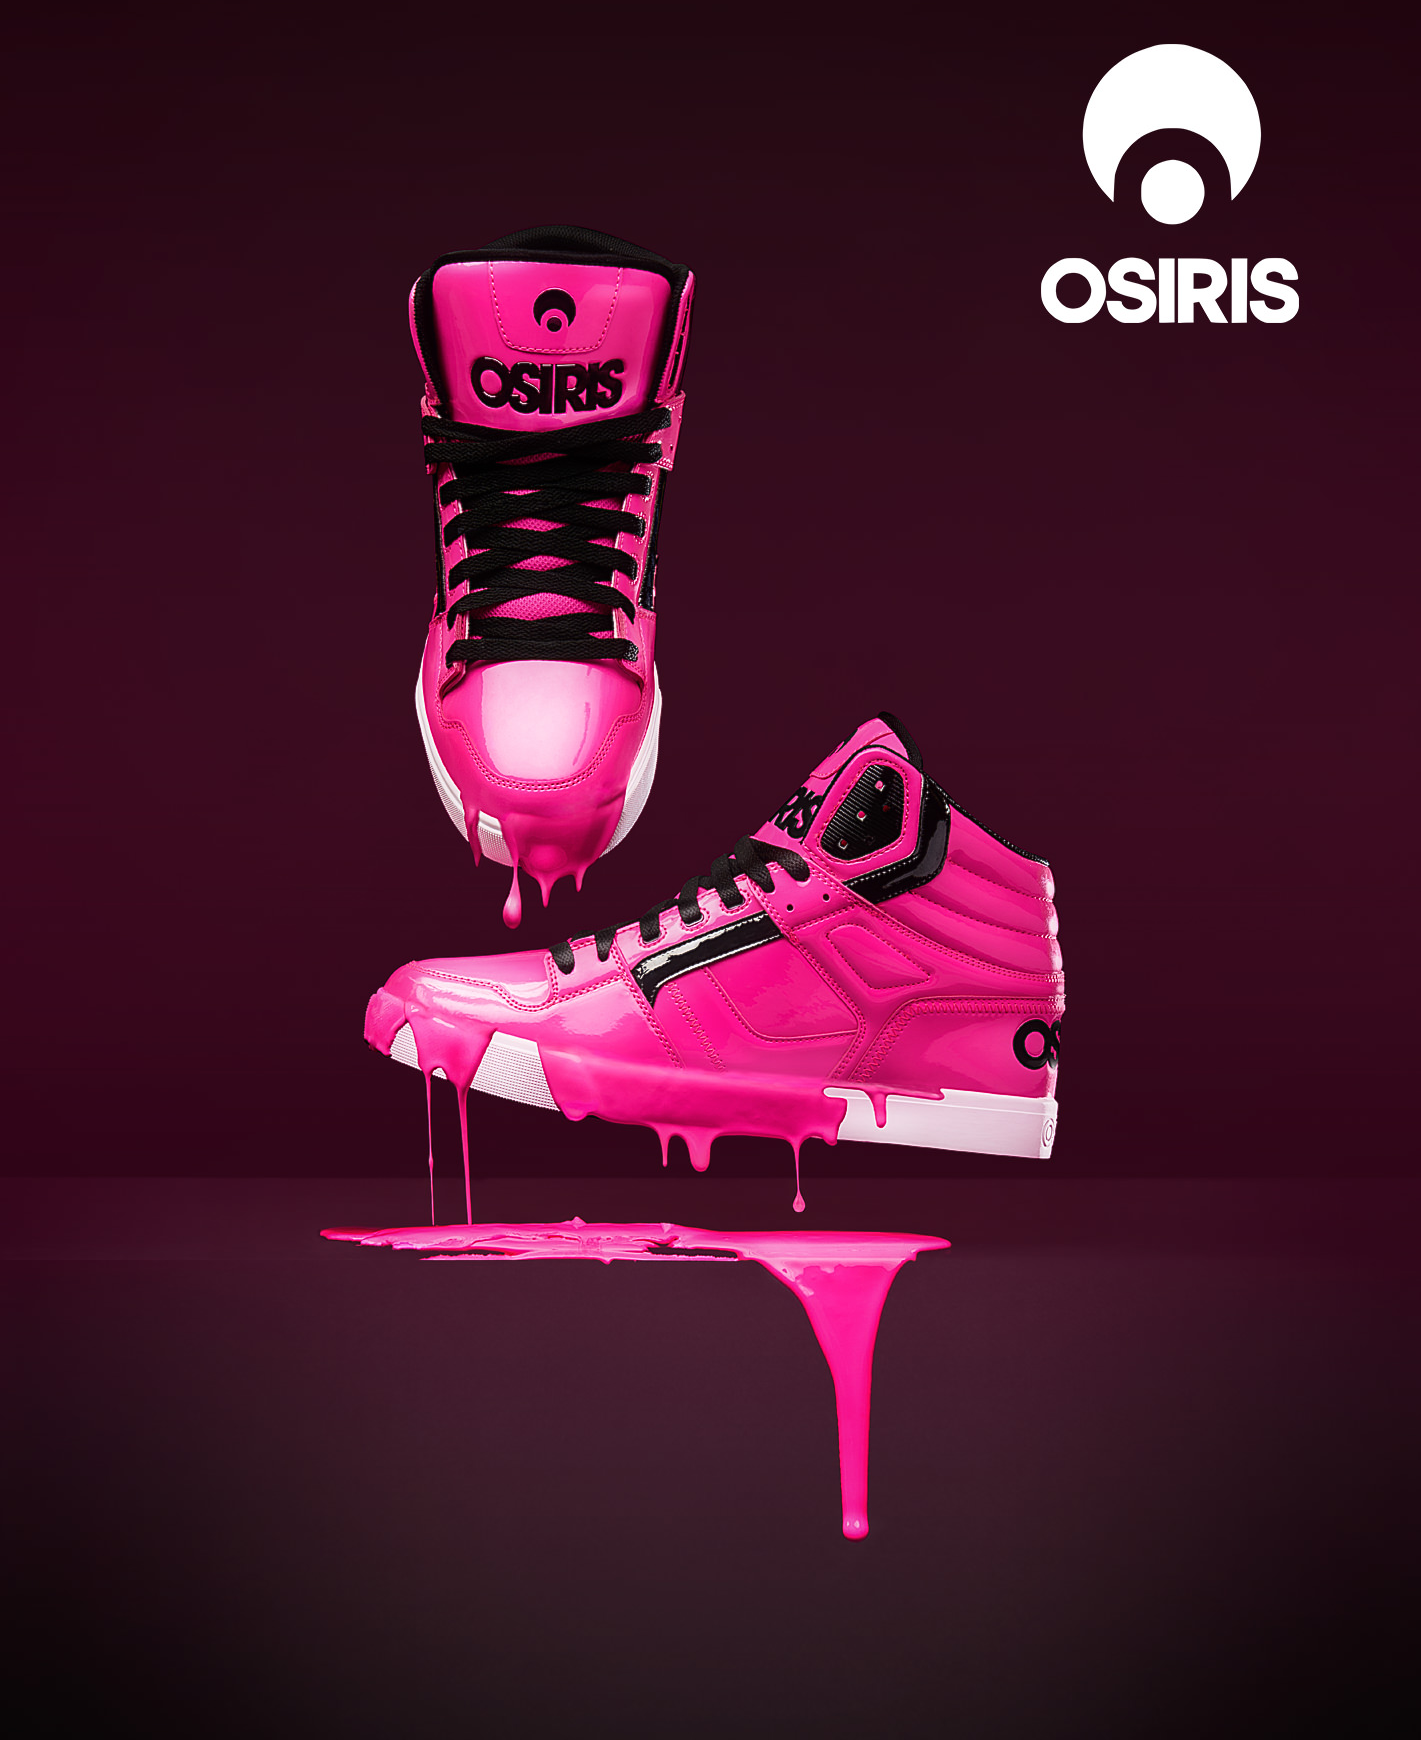 RossJames_Osiris-Shoes_PINK1.png